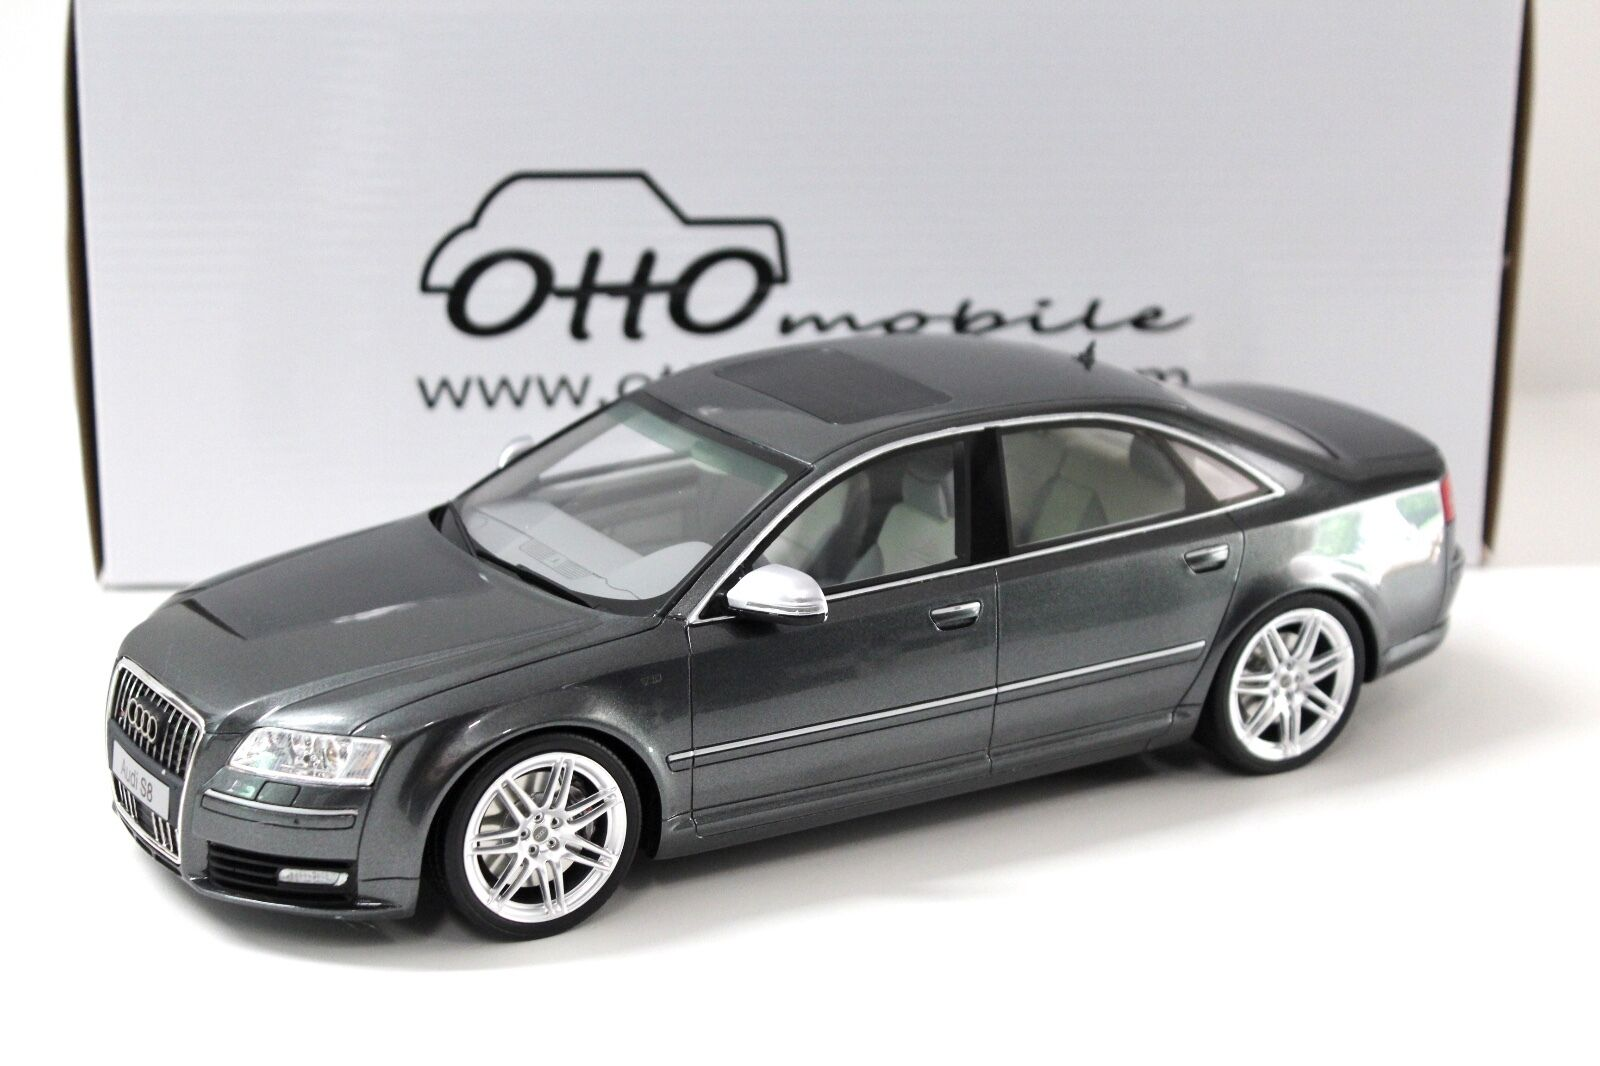 1 18 18 18 OTTO Audi A8 S8 D3 grey 2008 NEW bei PREMIUM-MODELCARS d57685